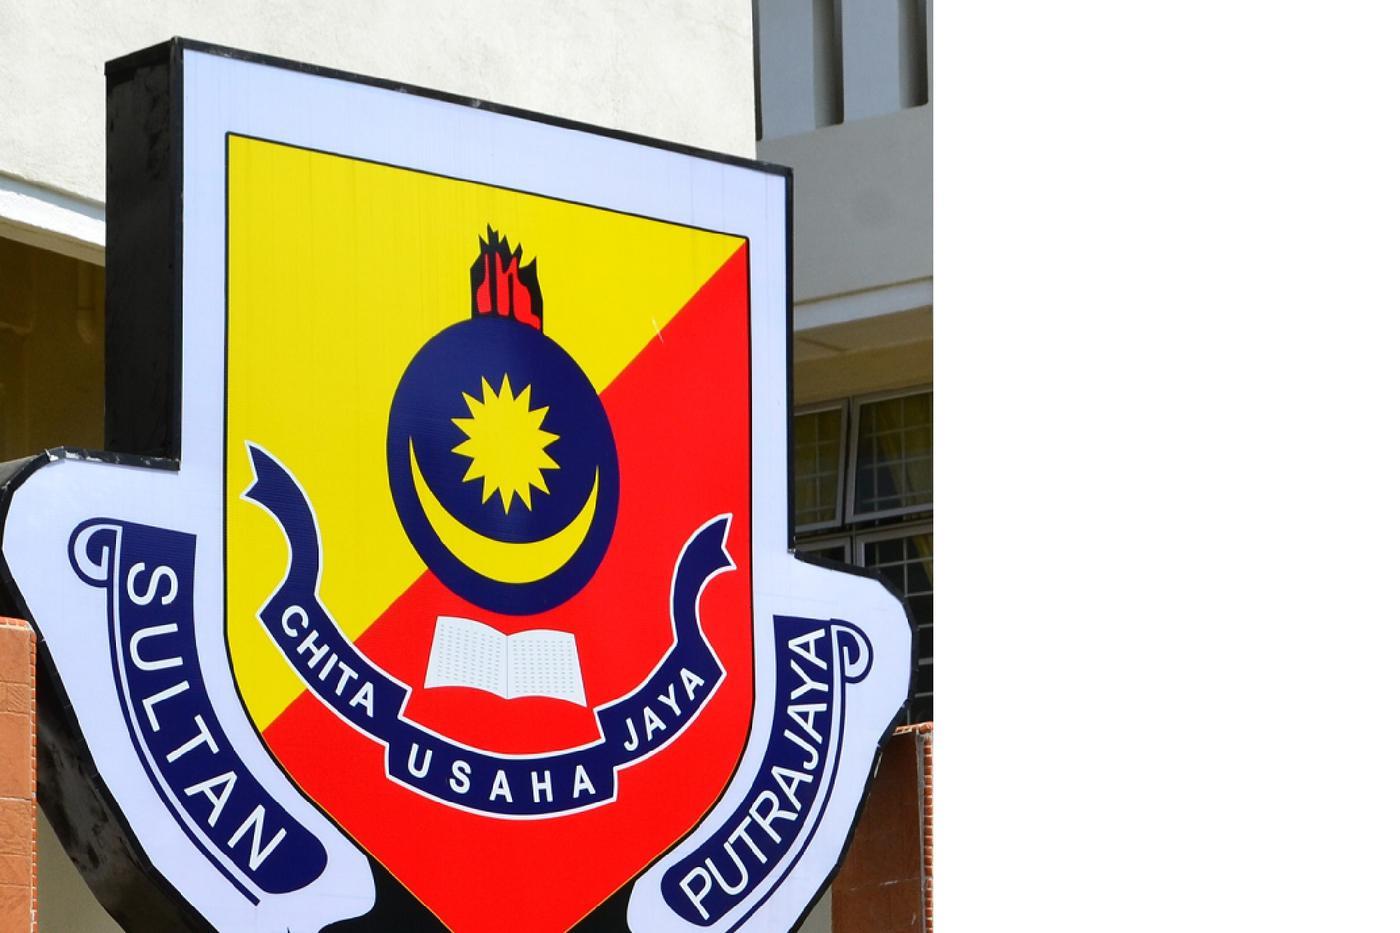 Sekolah Sultan Alam Shah Listen Notes